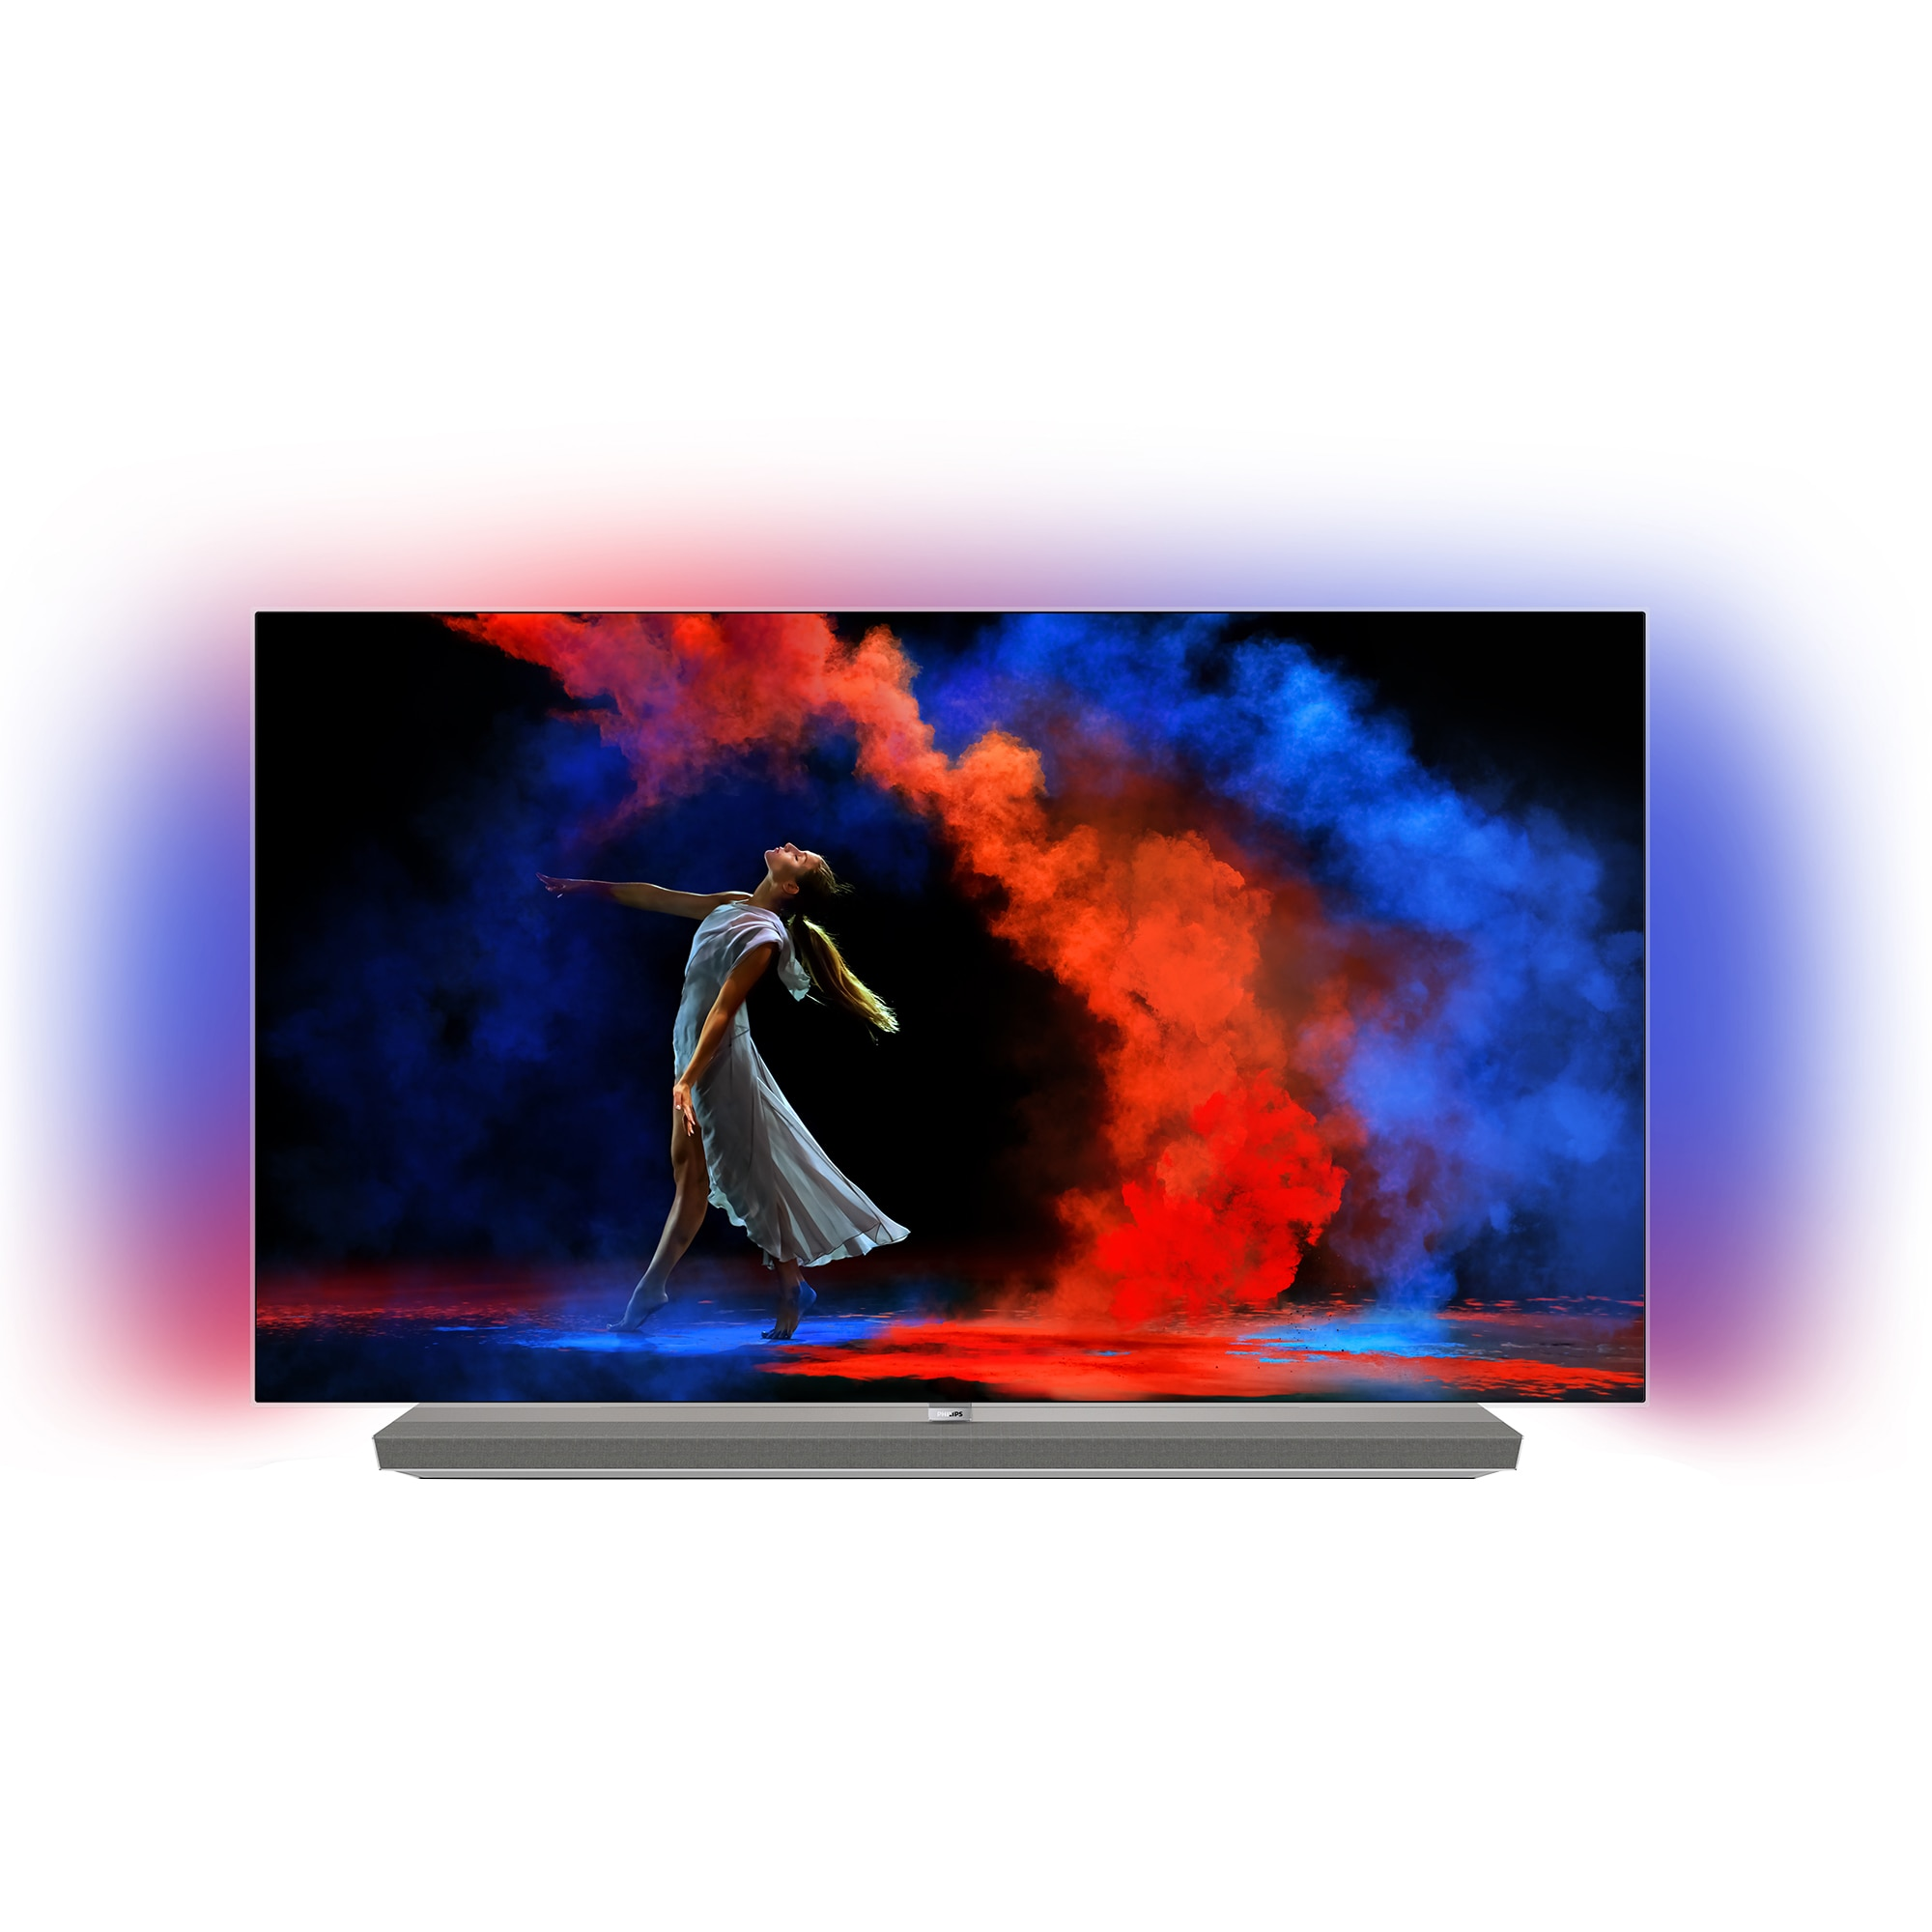 Fotografie Televizor OLED Smart Android Philips, 164 cm, 65OLED973/12, 4K Ultra HD